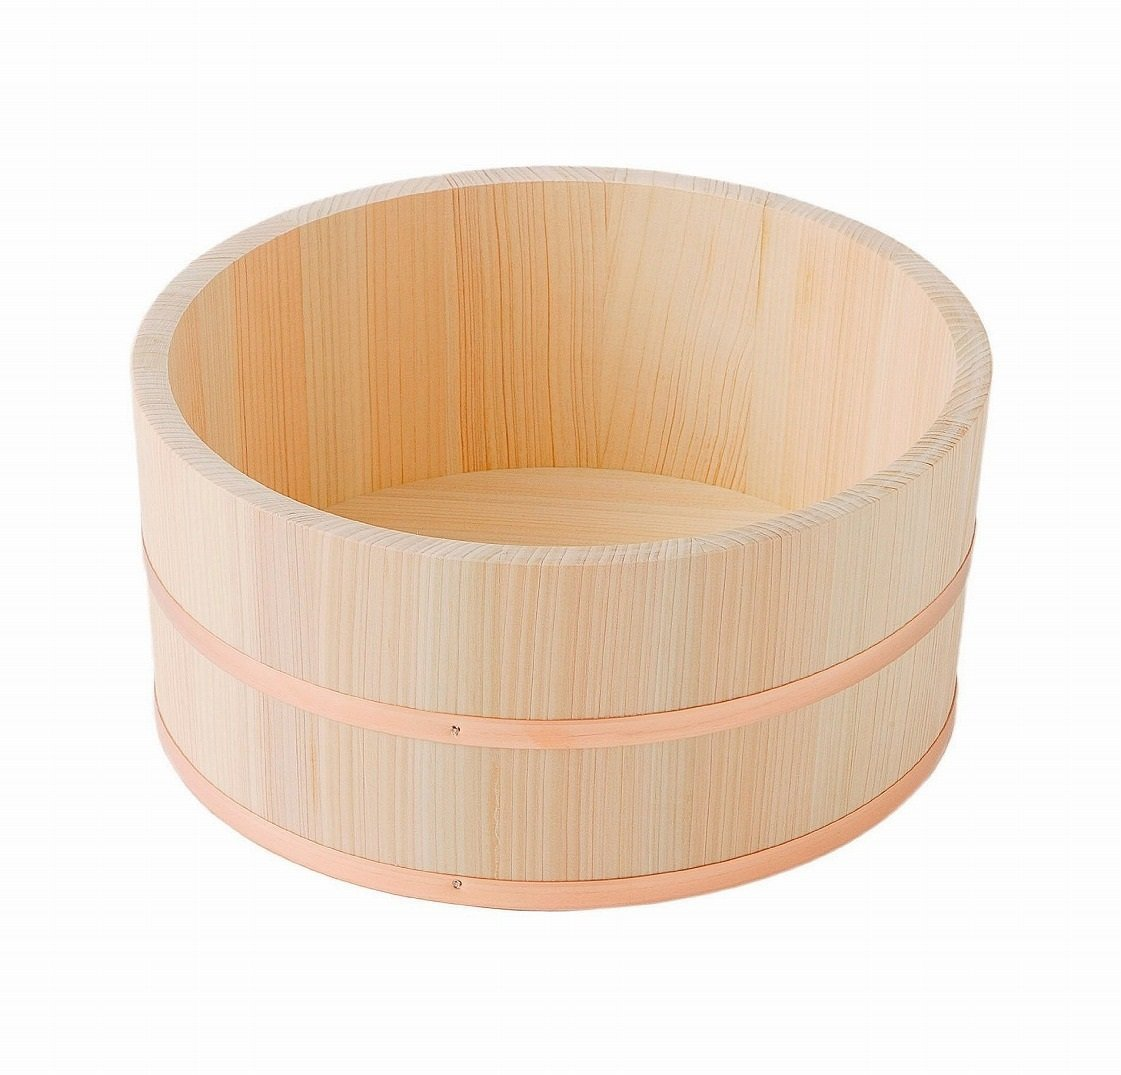 Made in Japan Hinoki Oke Pure Wood Bathtub Large Bucket